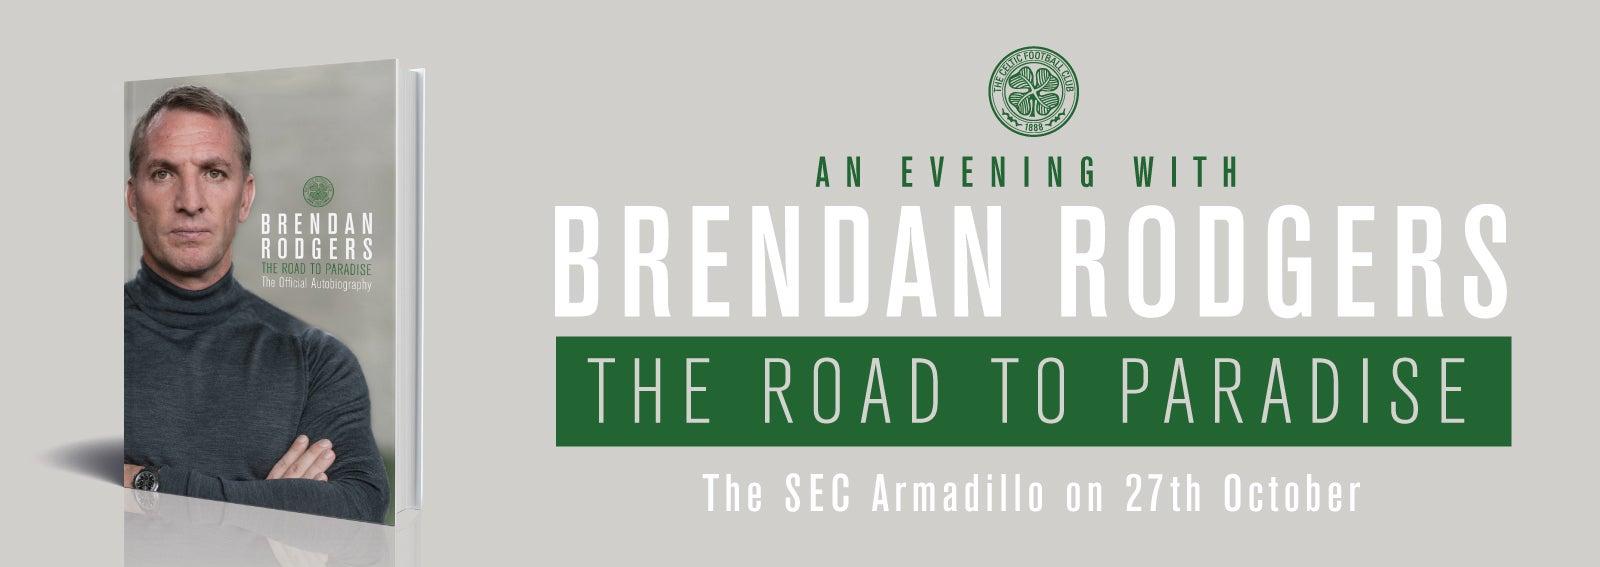 Celtic-An-Evening-with-Brendan-Arm_1600x567.jpg